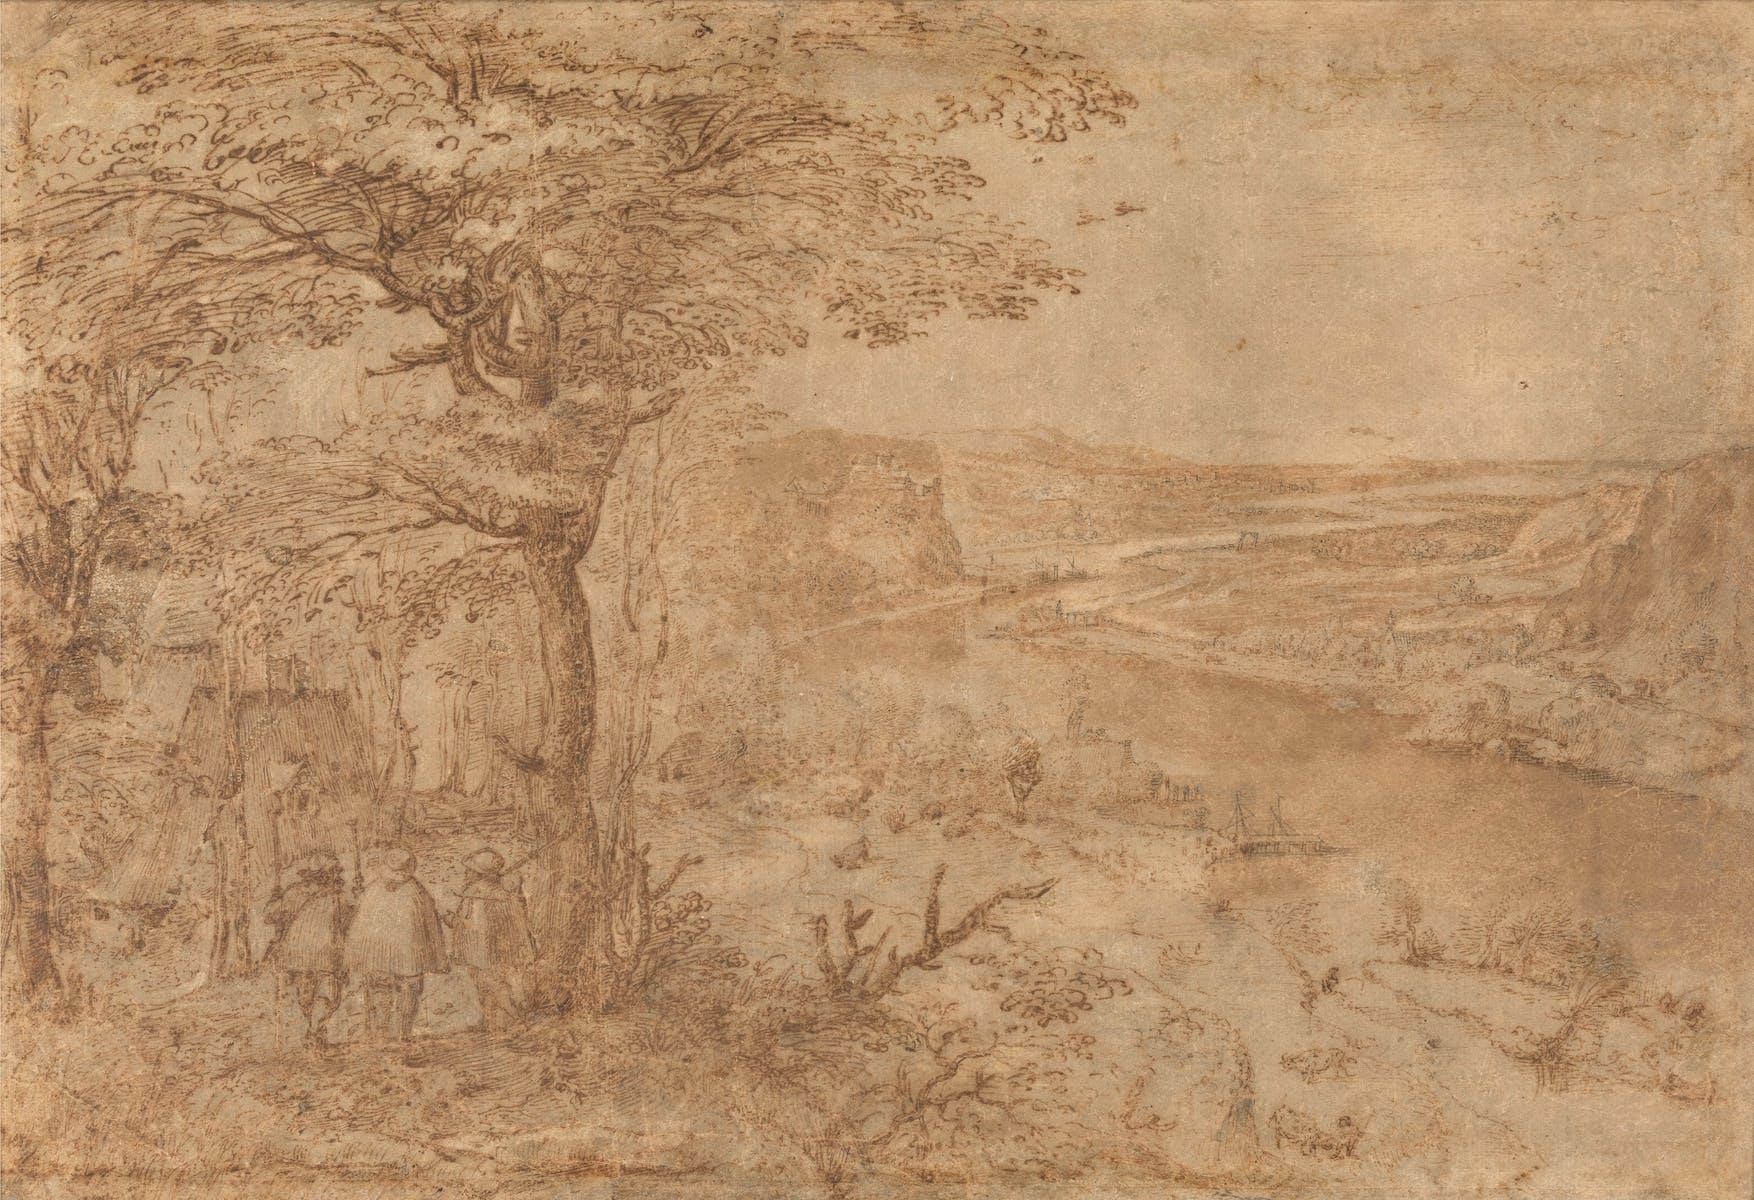 Pieter Bruegel the Elder, Hilly landscape with Three Pelgrims